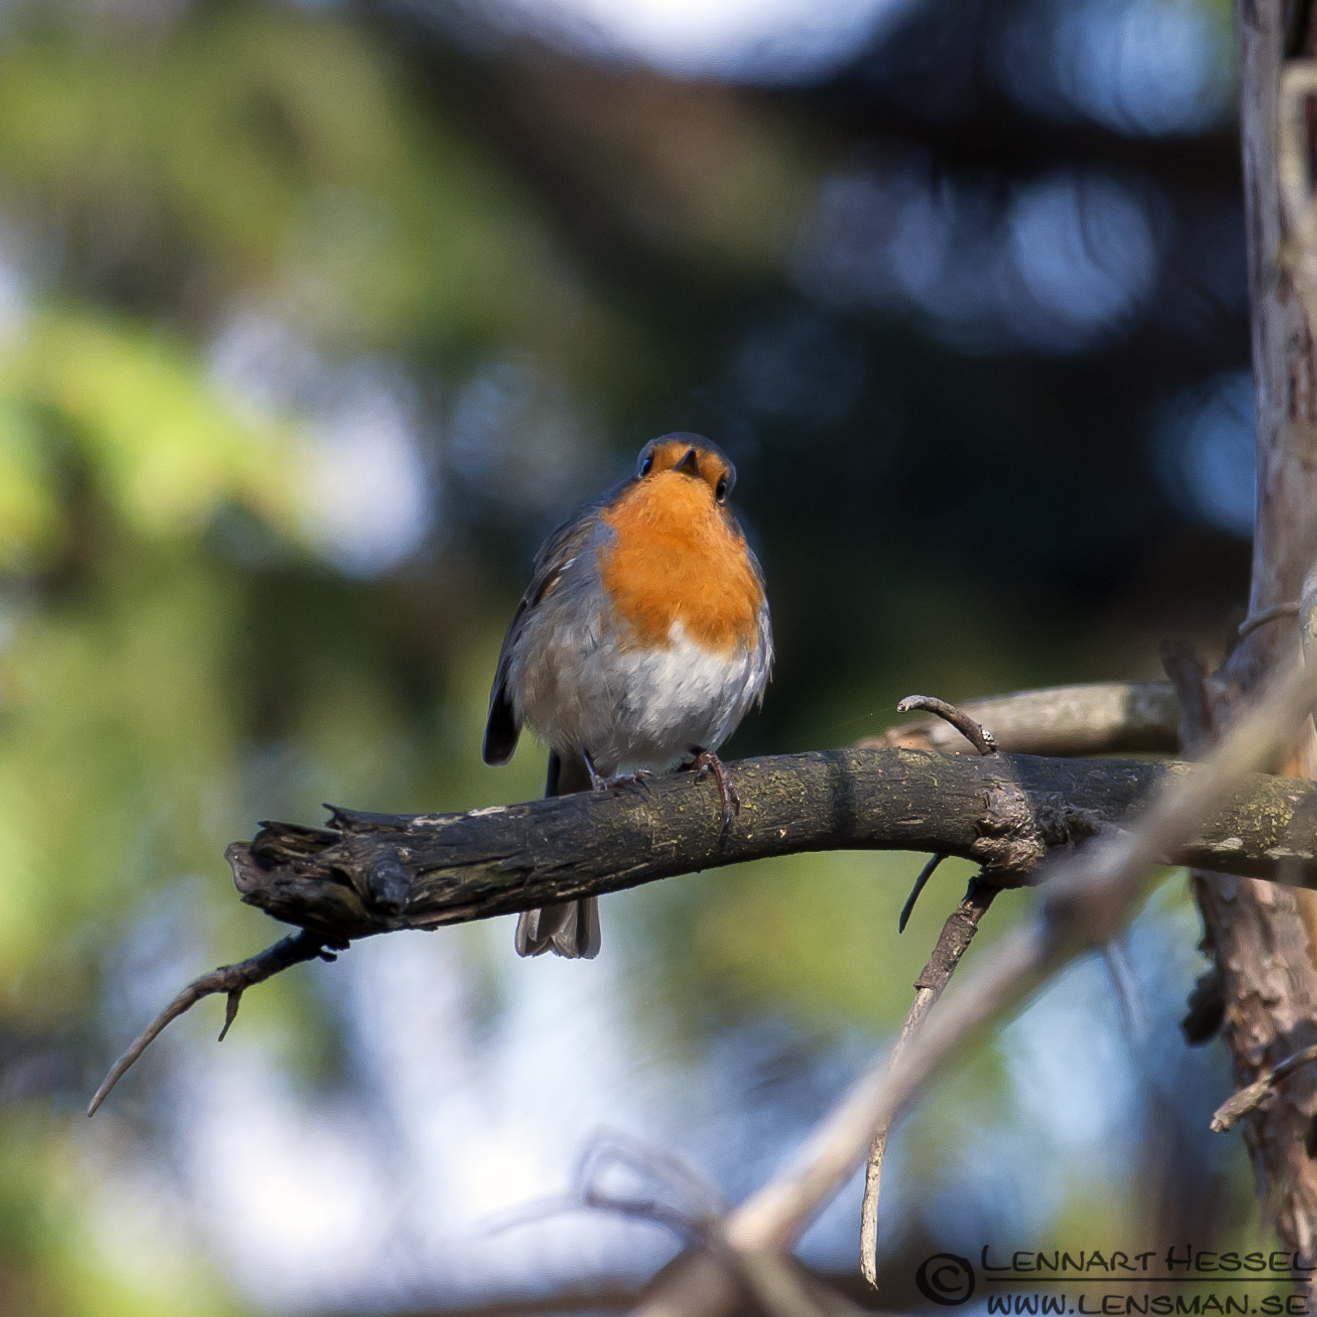 European Robin confirmation